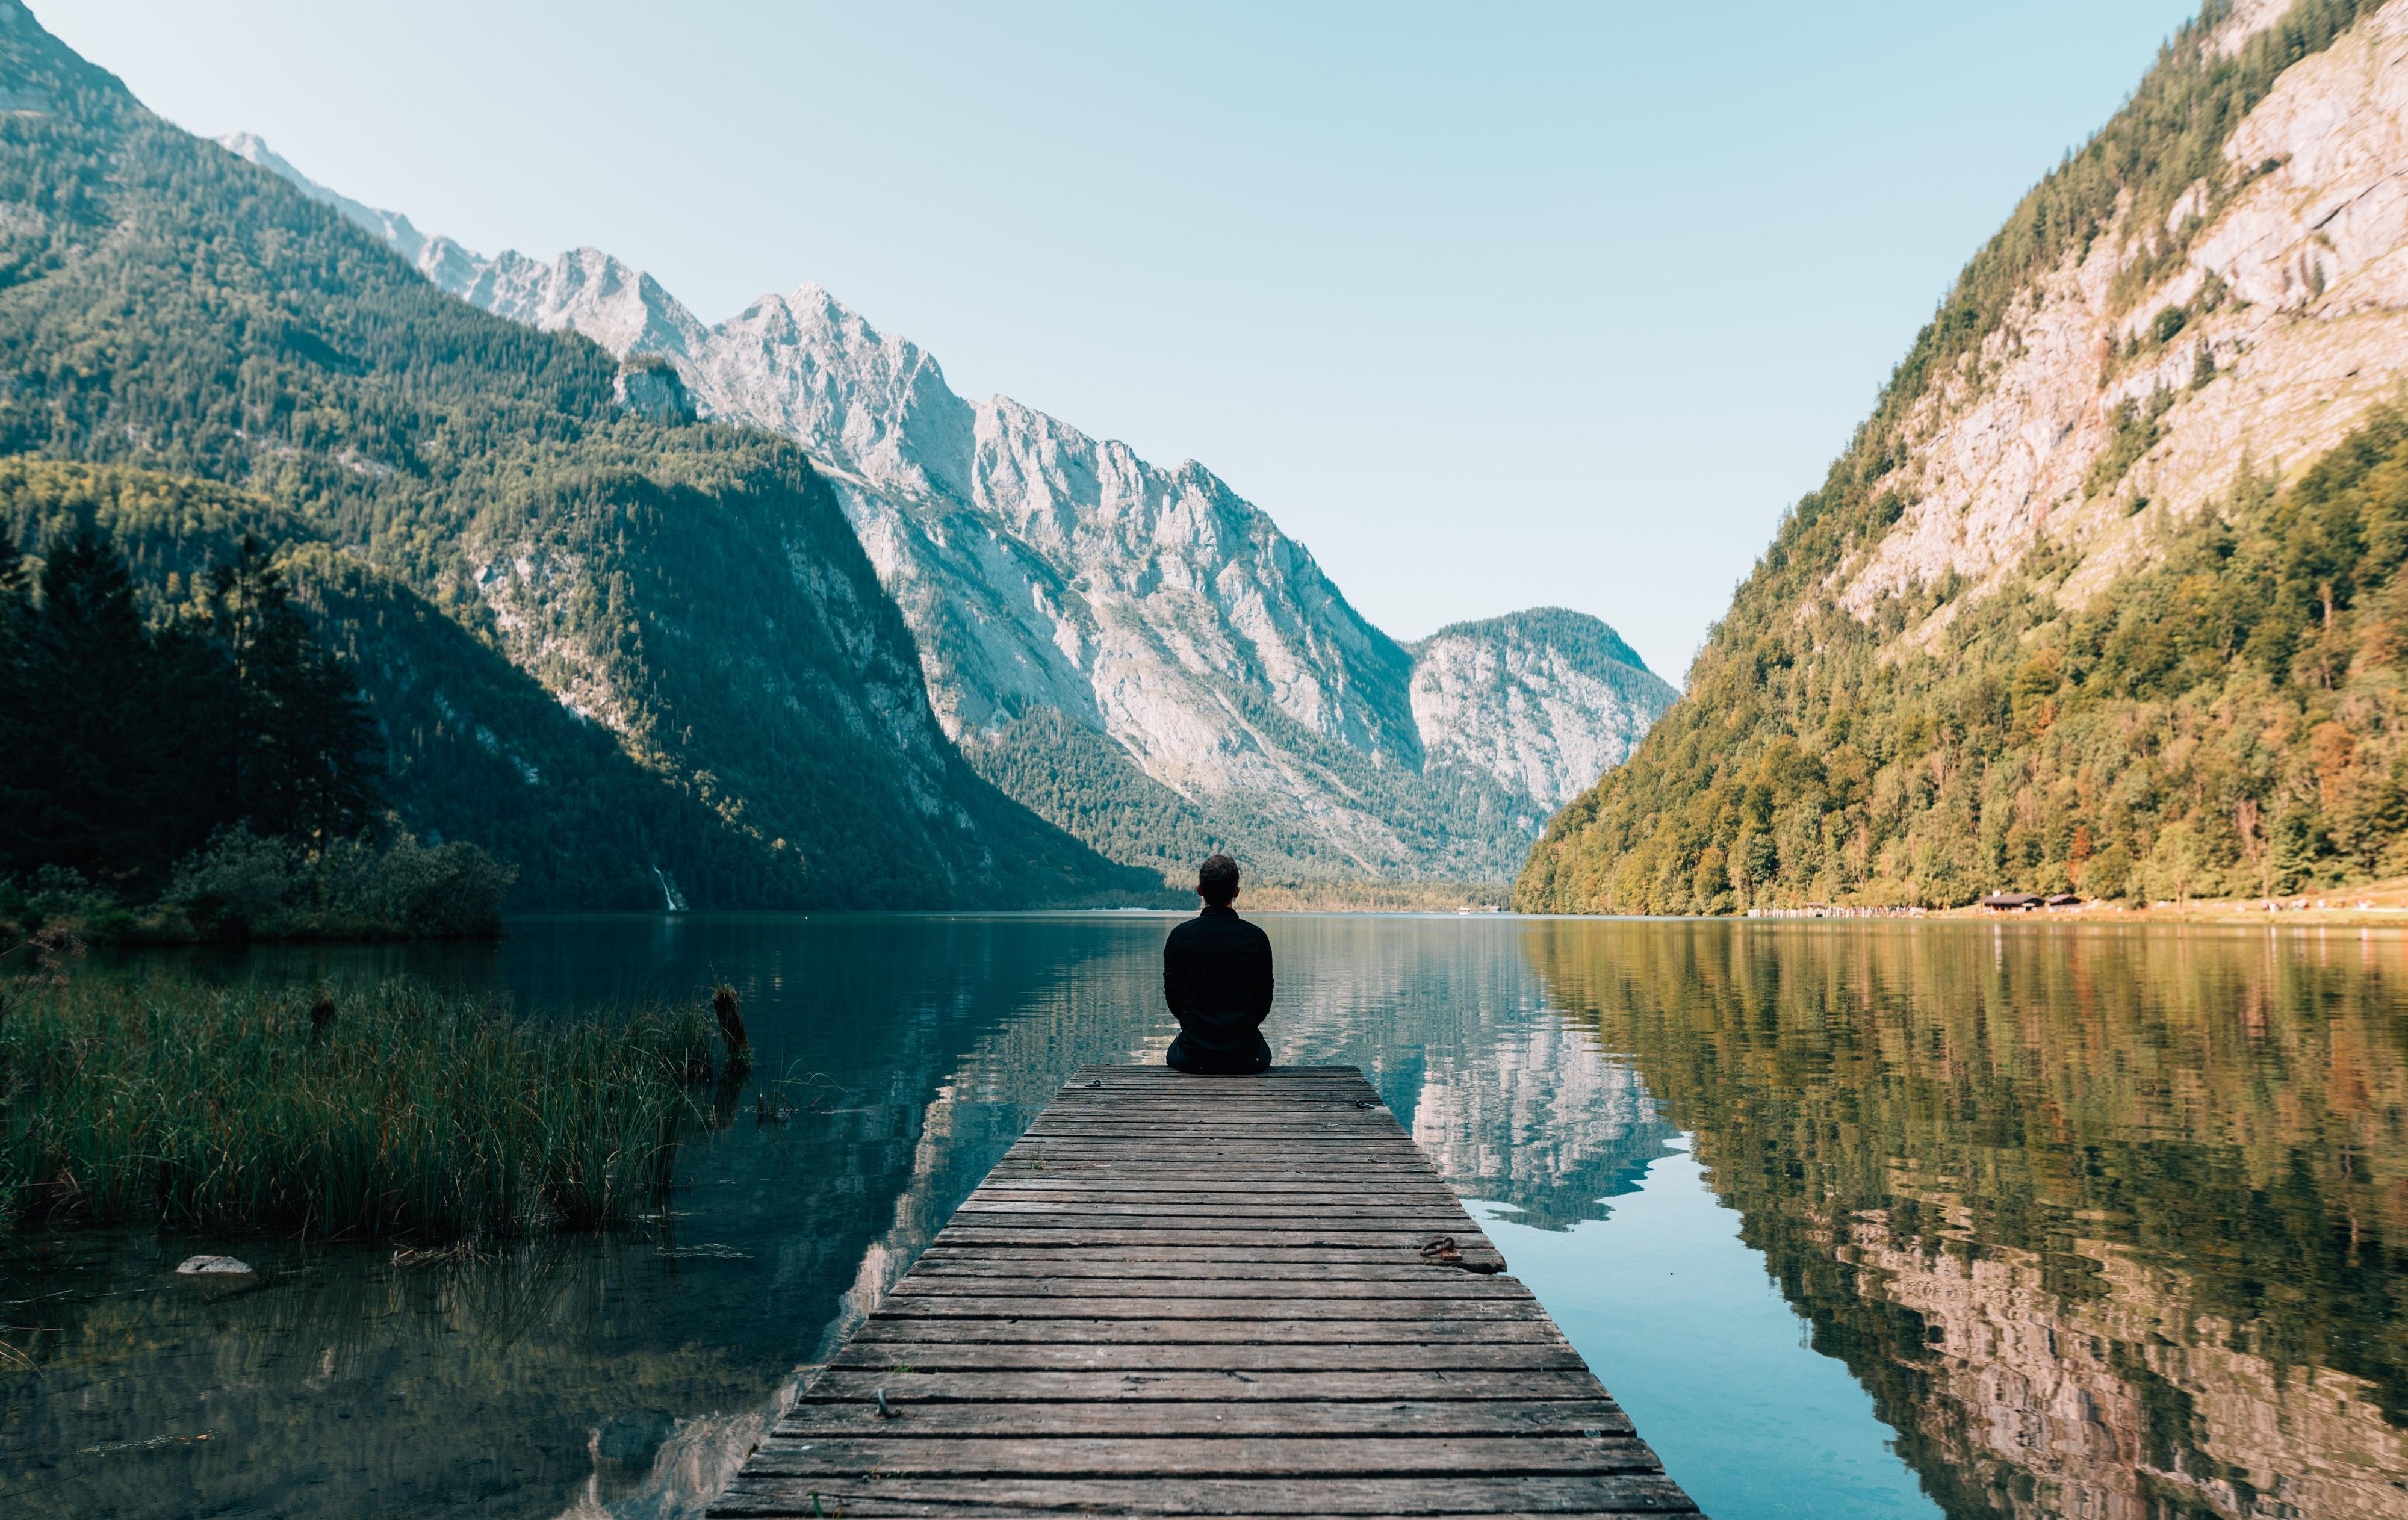 man-sitting-on-dock